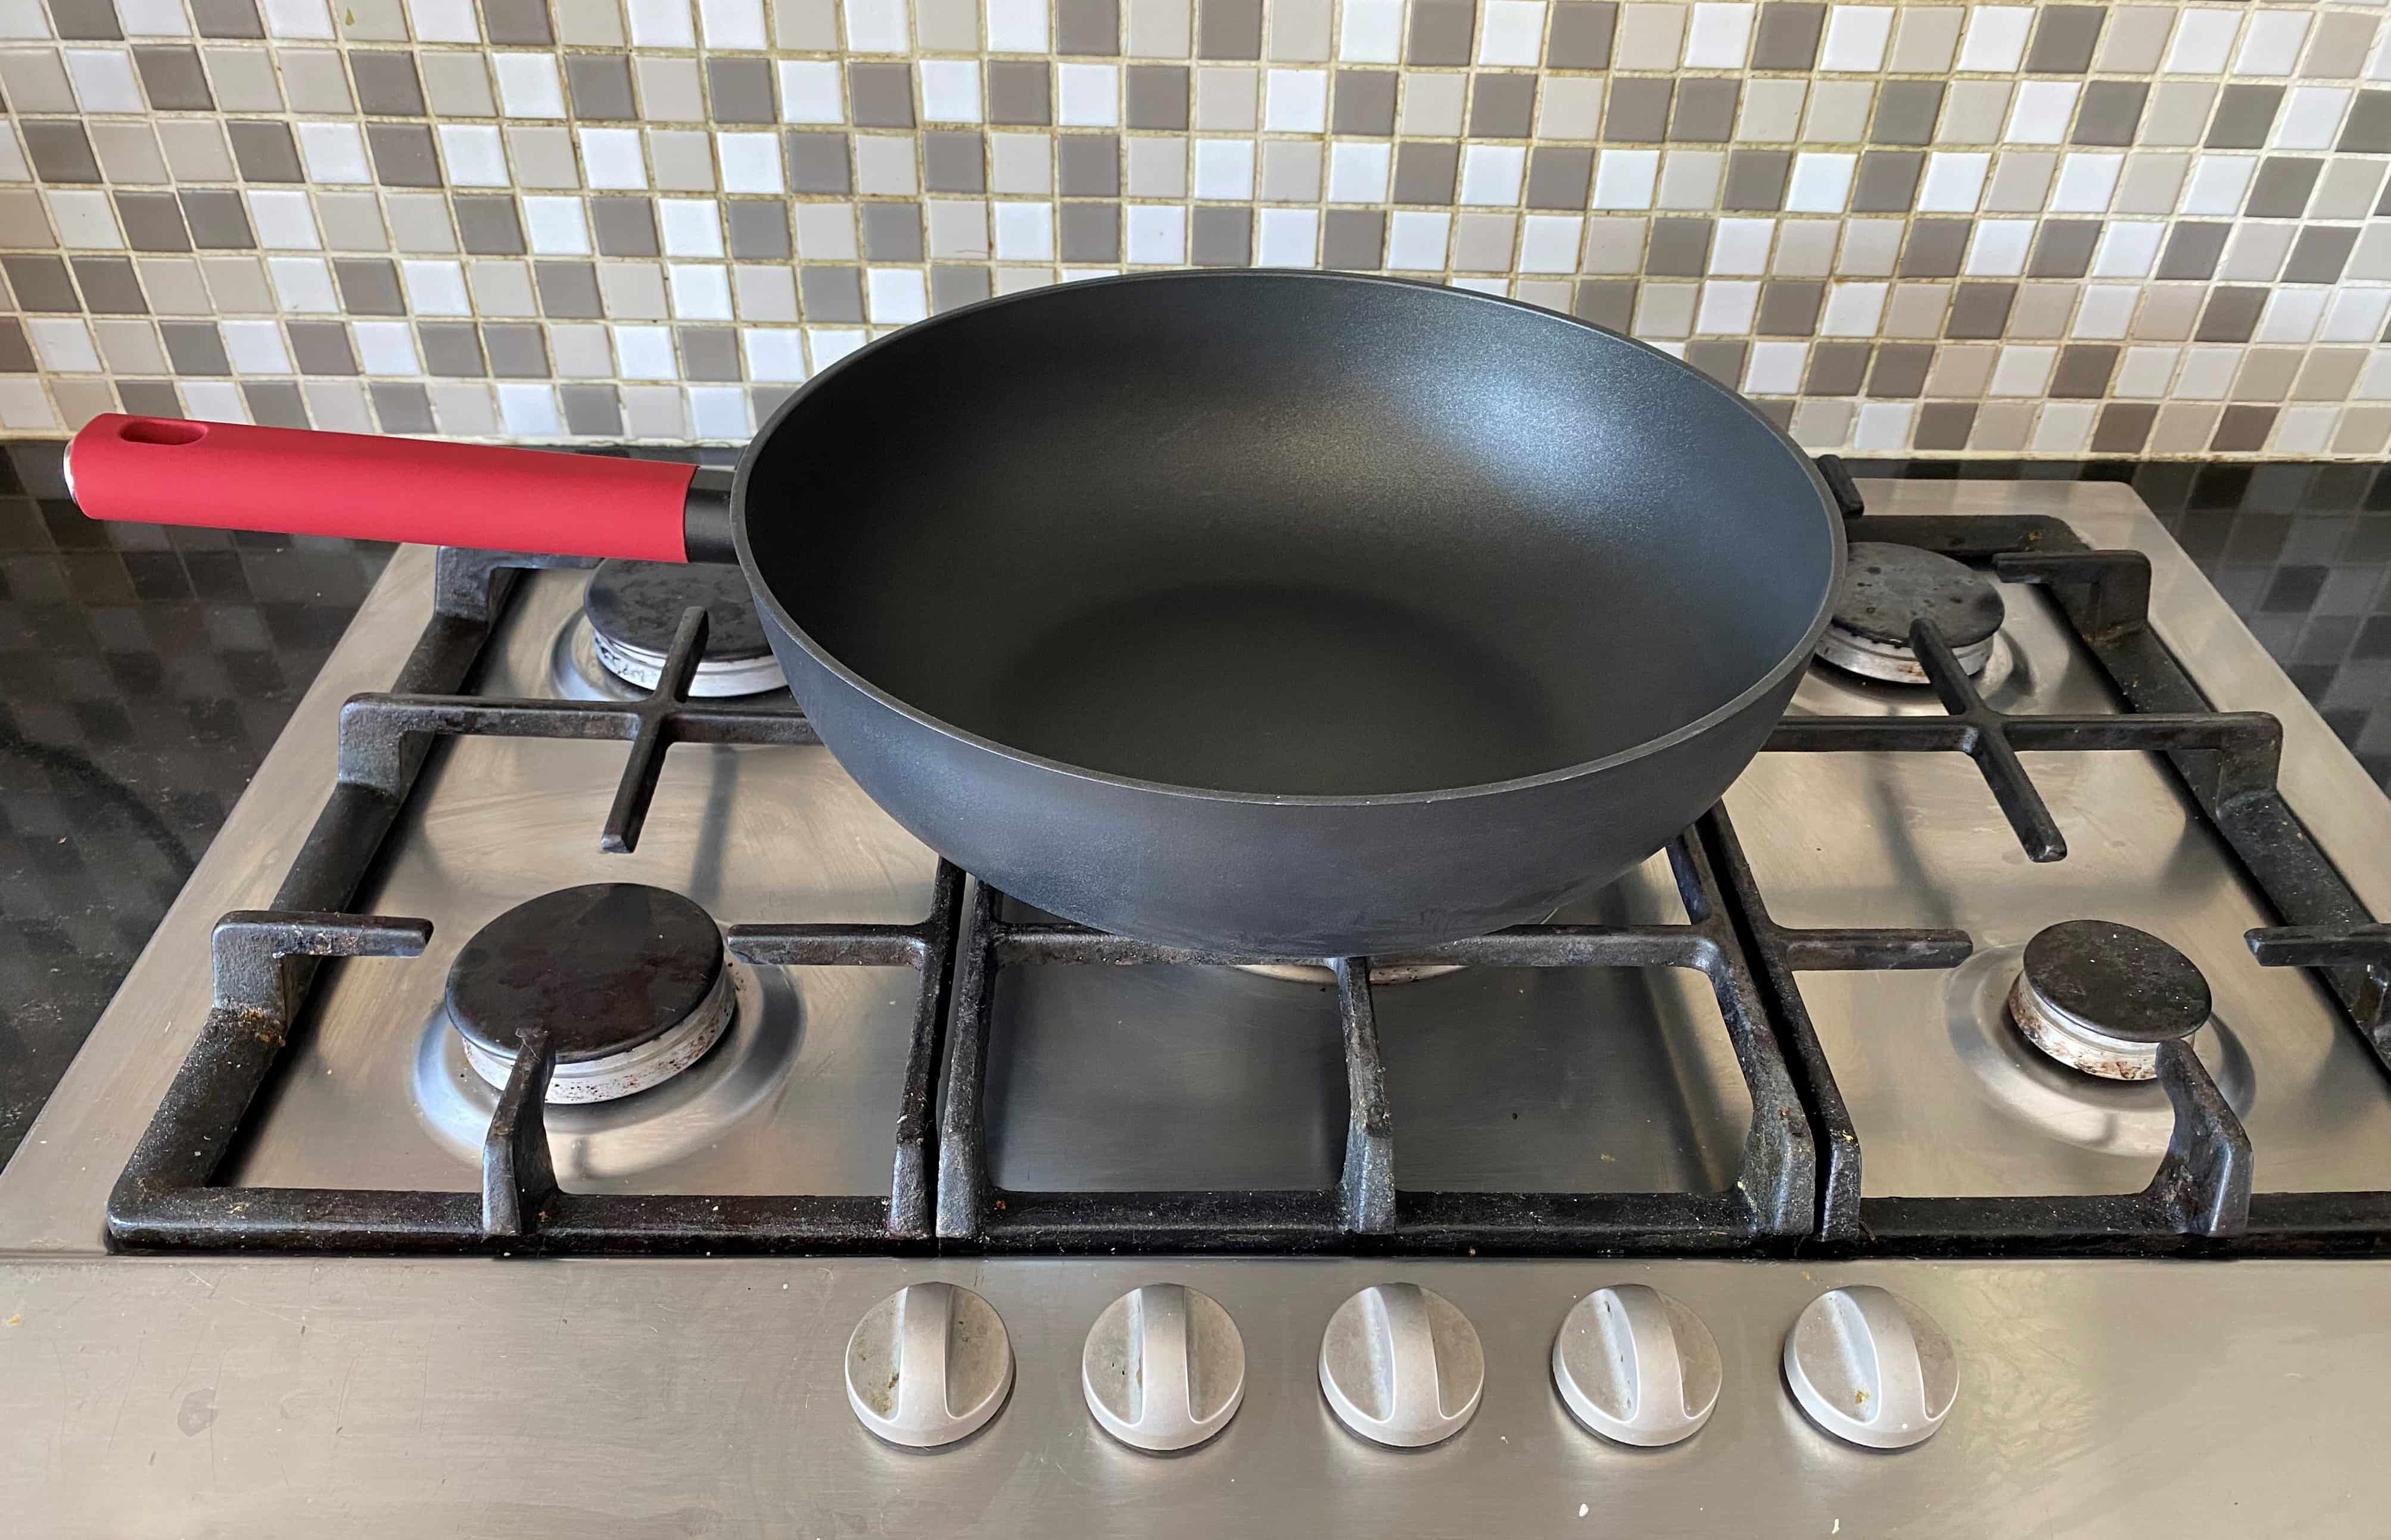 4goodz Aluminium Wokpan met siliconen handvat 30 cm - zwart/rood